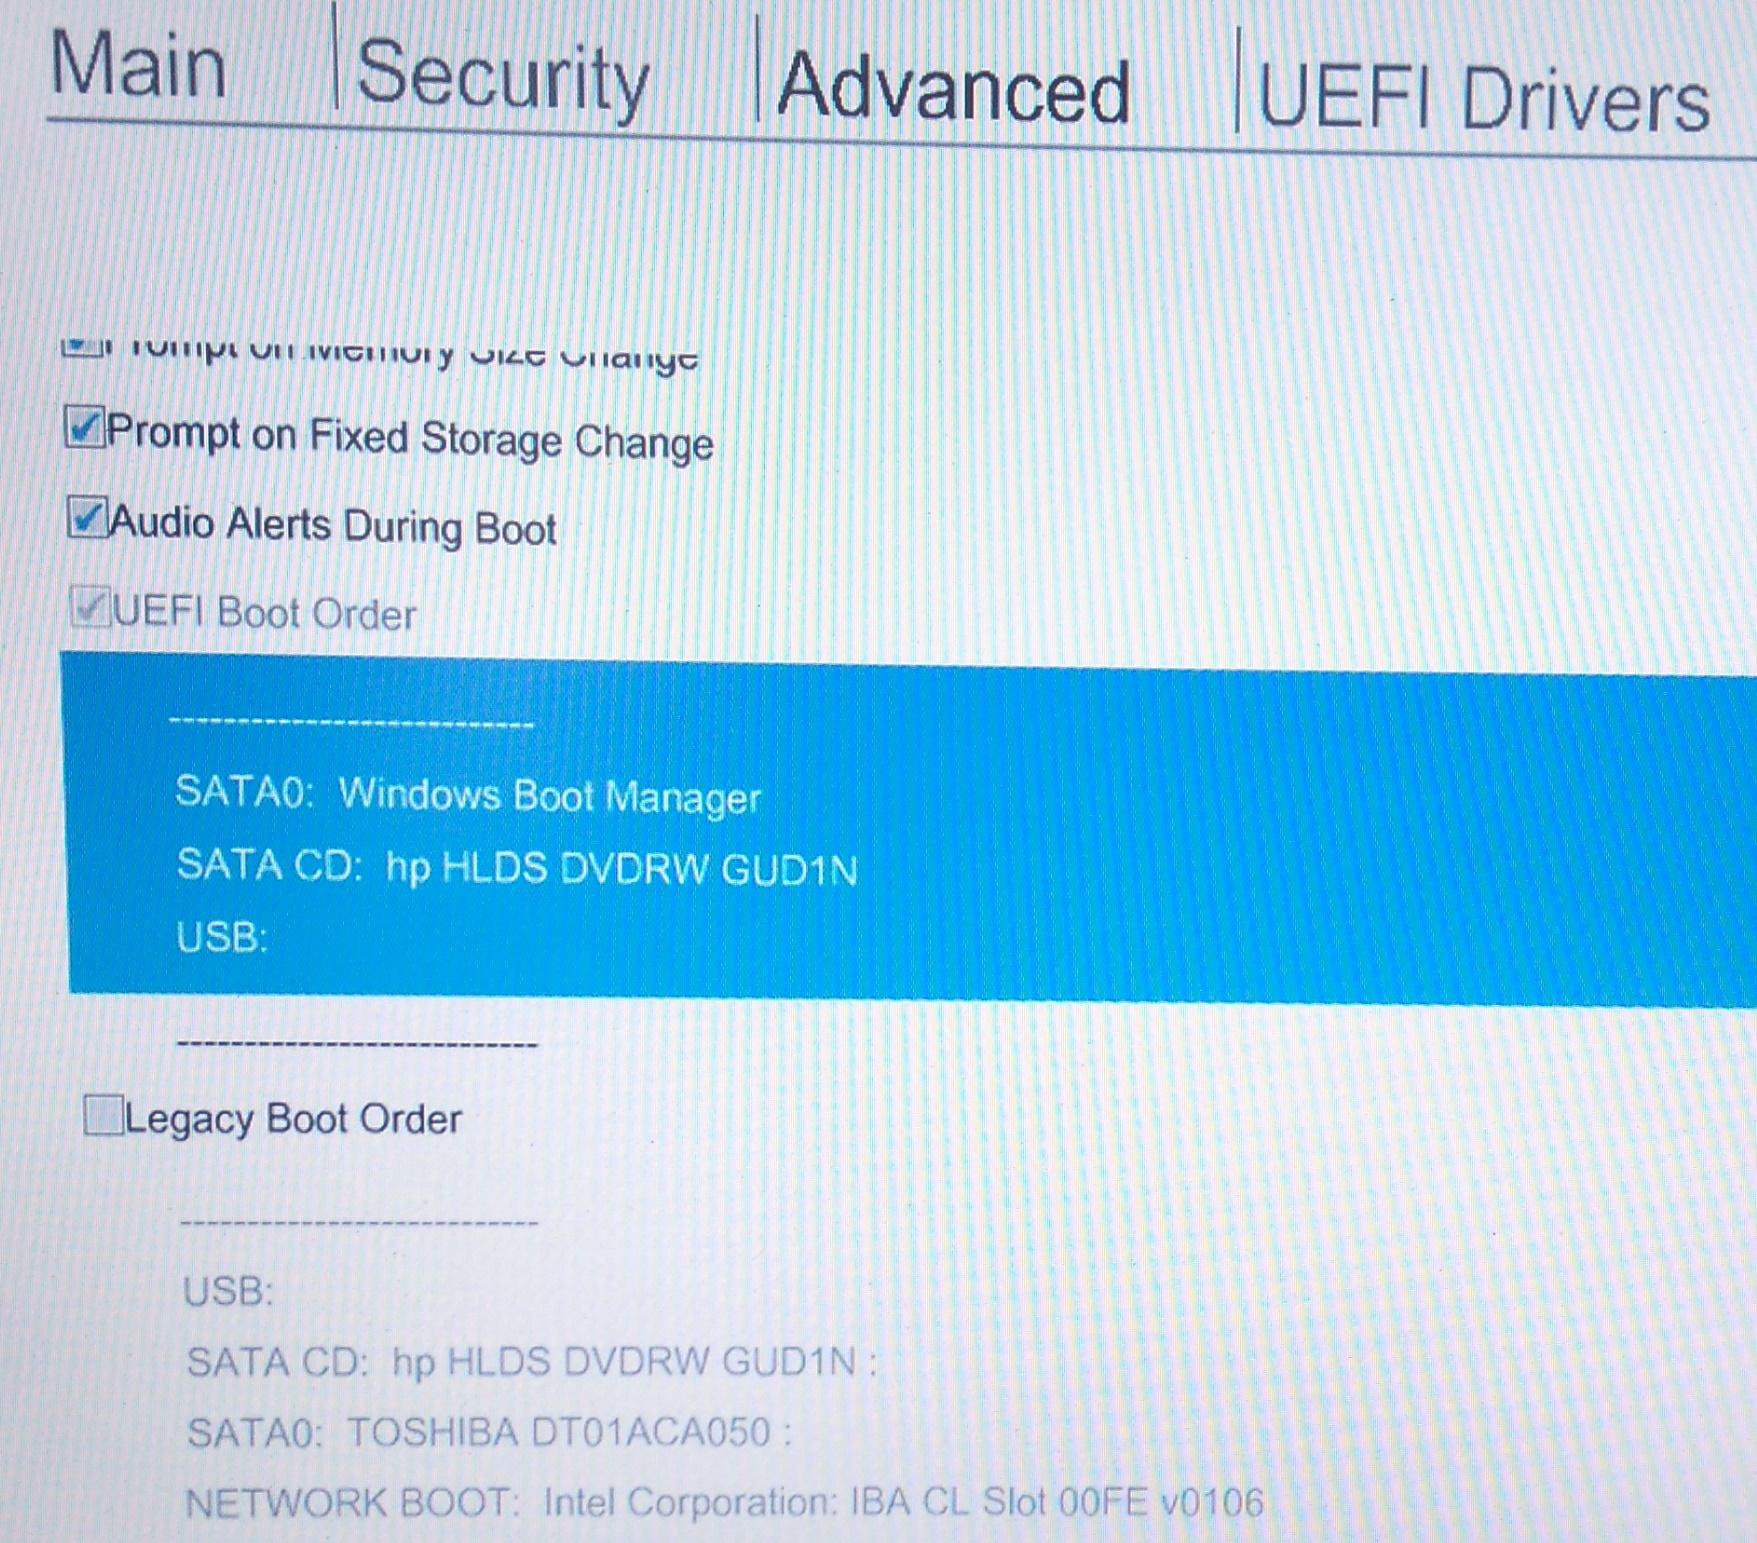 VGA disabled in EliteDesk 800 (British model)? - eehelp com